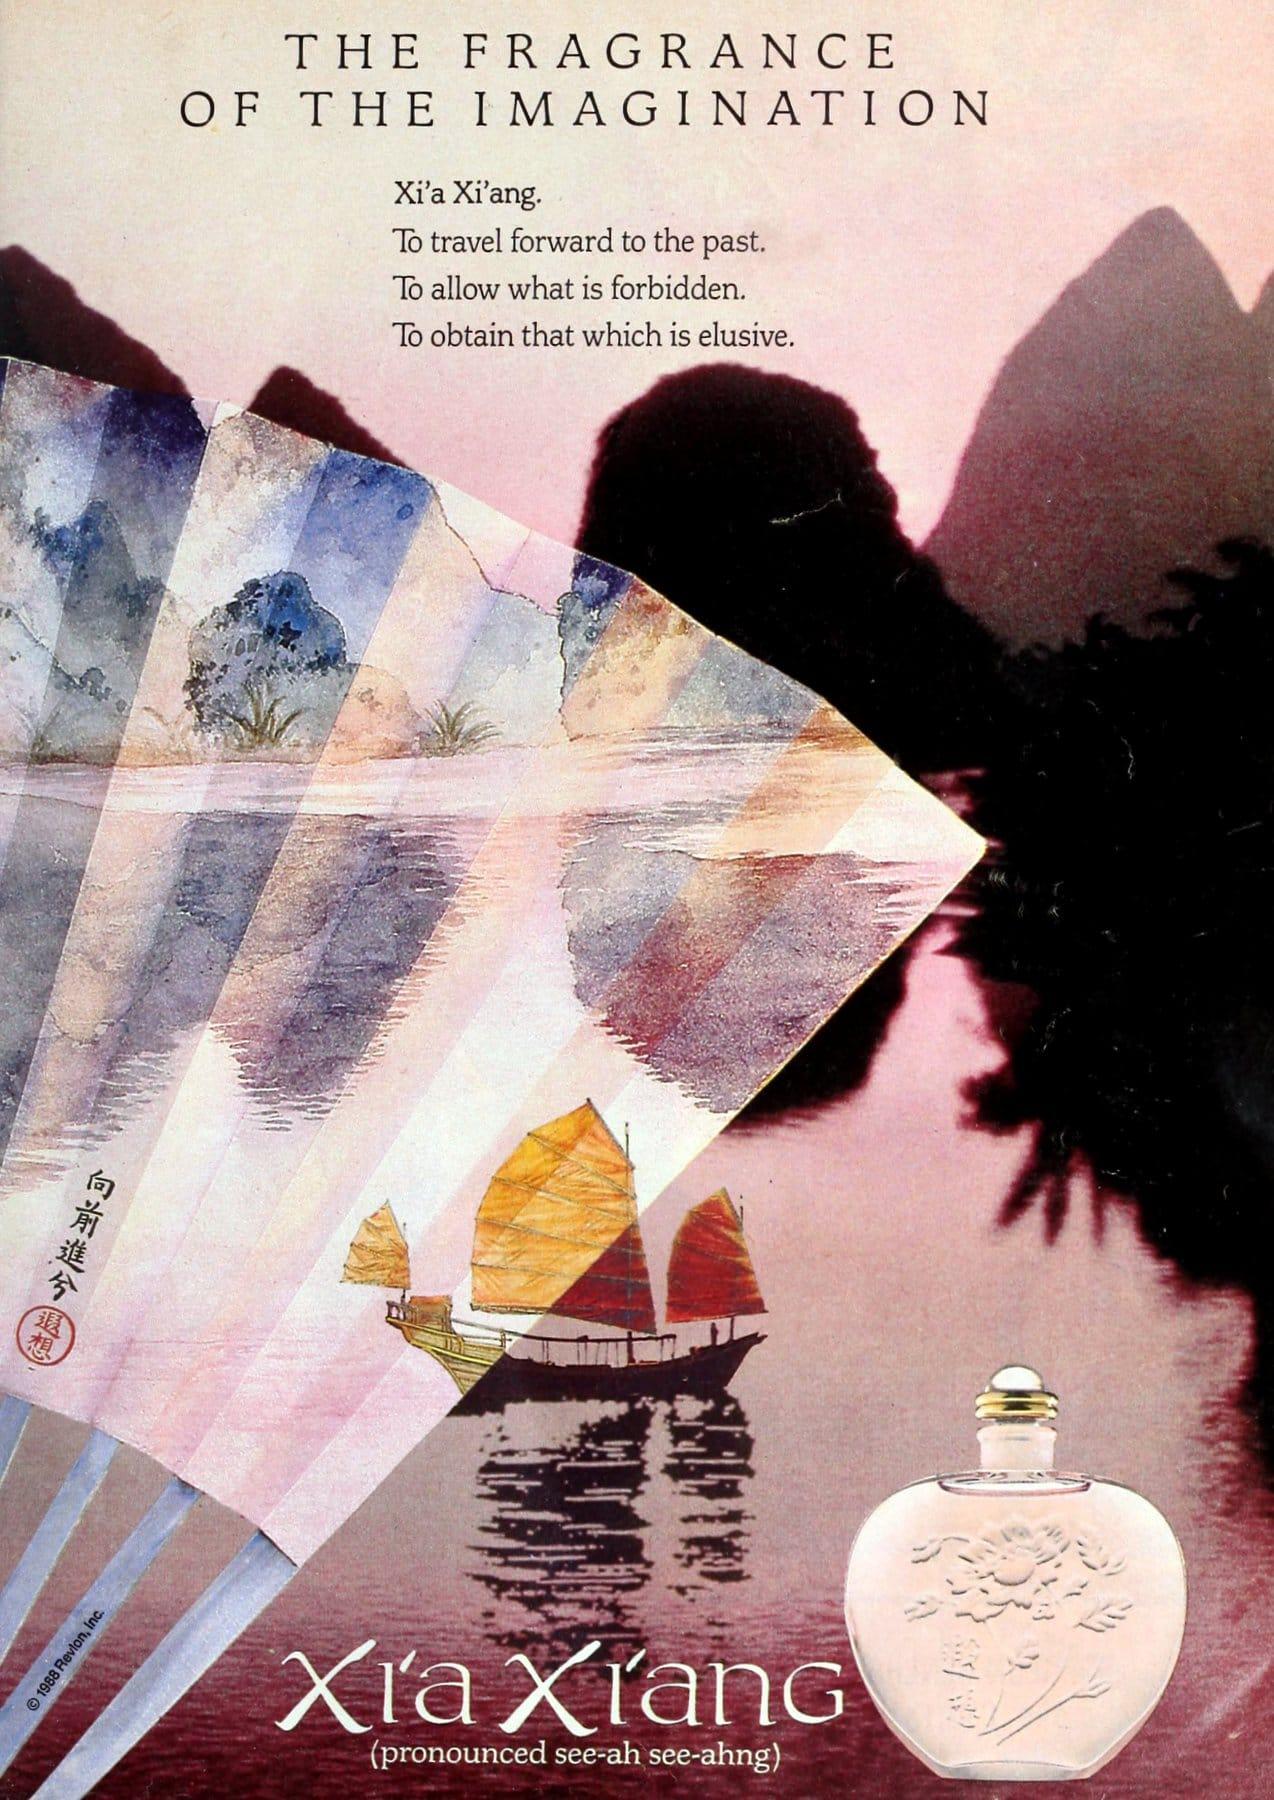 Vintage eighties Xi'a Xi'ang perfume (1988)